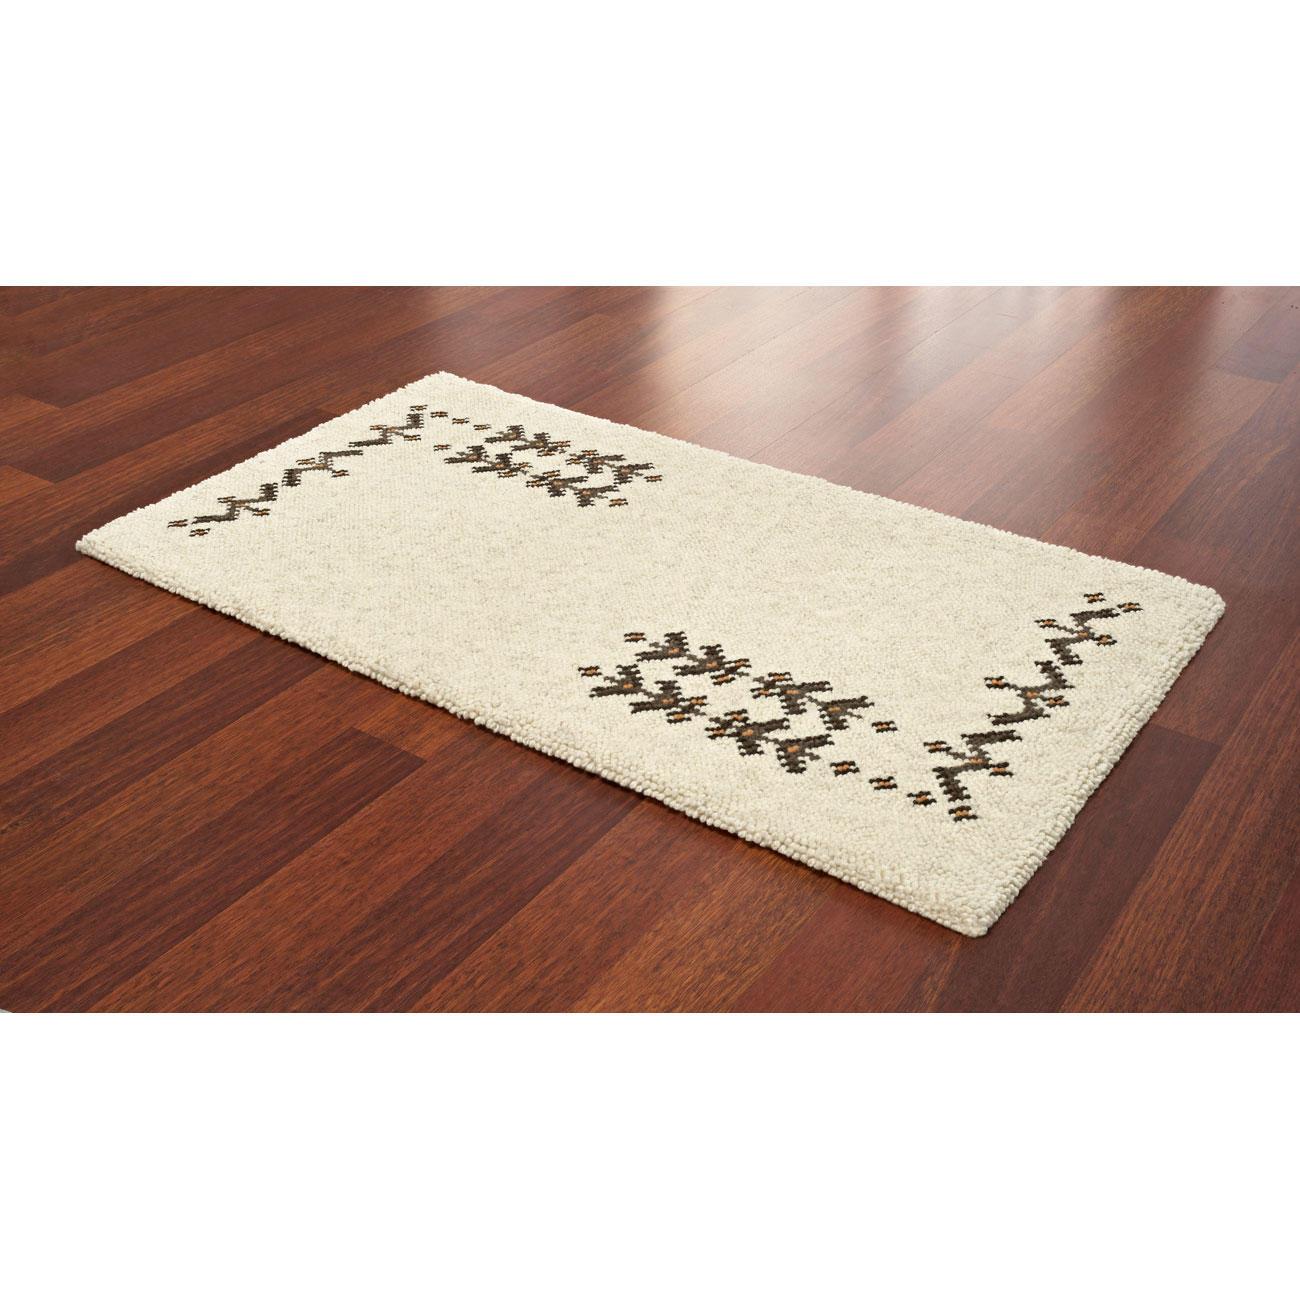 teppich tubu naturfarbene berberteppiche berber teppiche kn pfen im junghans wolle. Black Bedroom Furniture Sets. Home Design Ideas